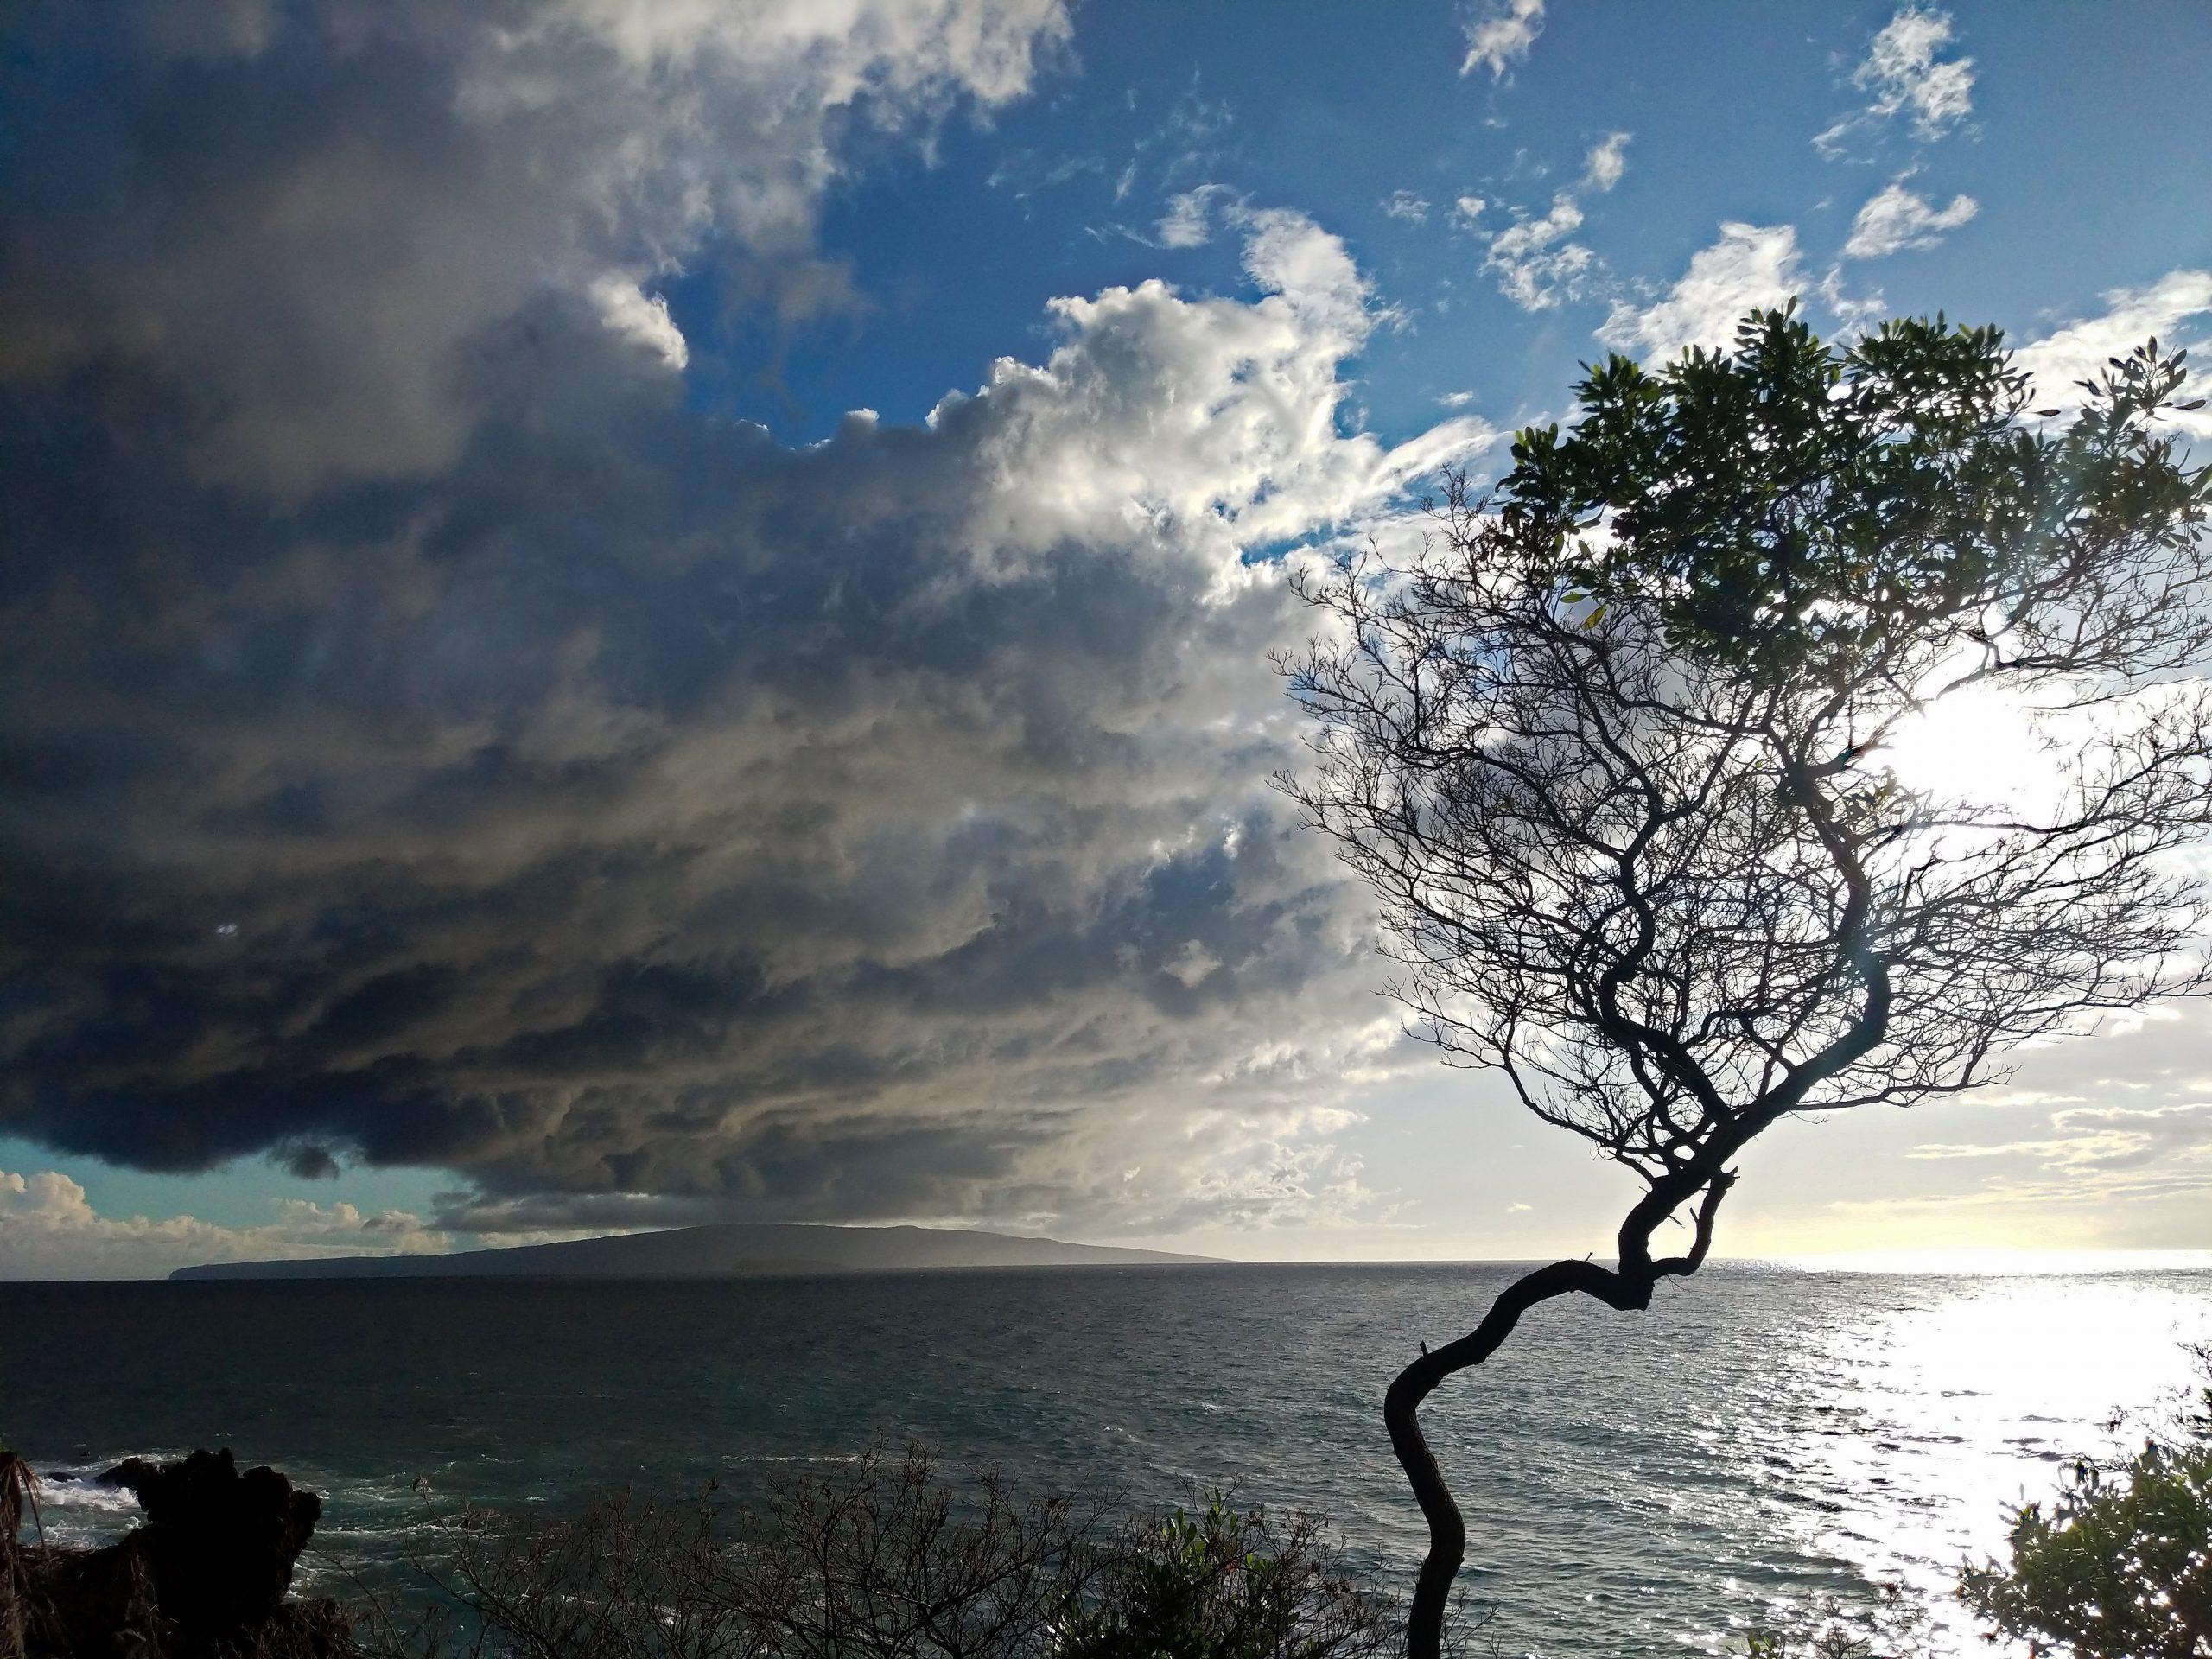 Incoming Storm at Wailea Beach